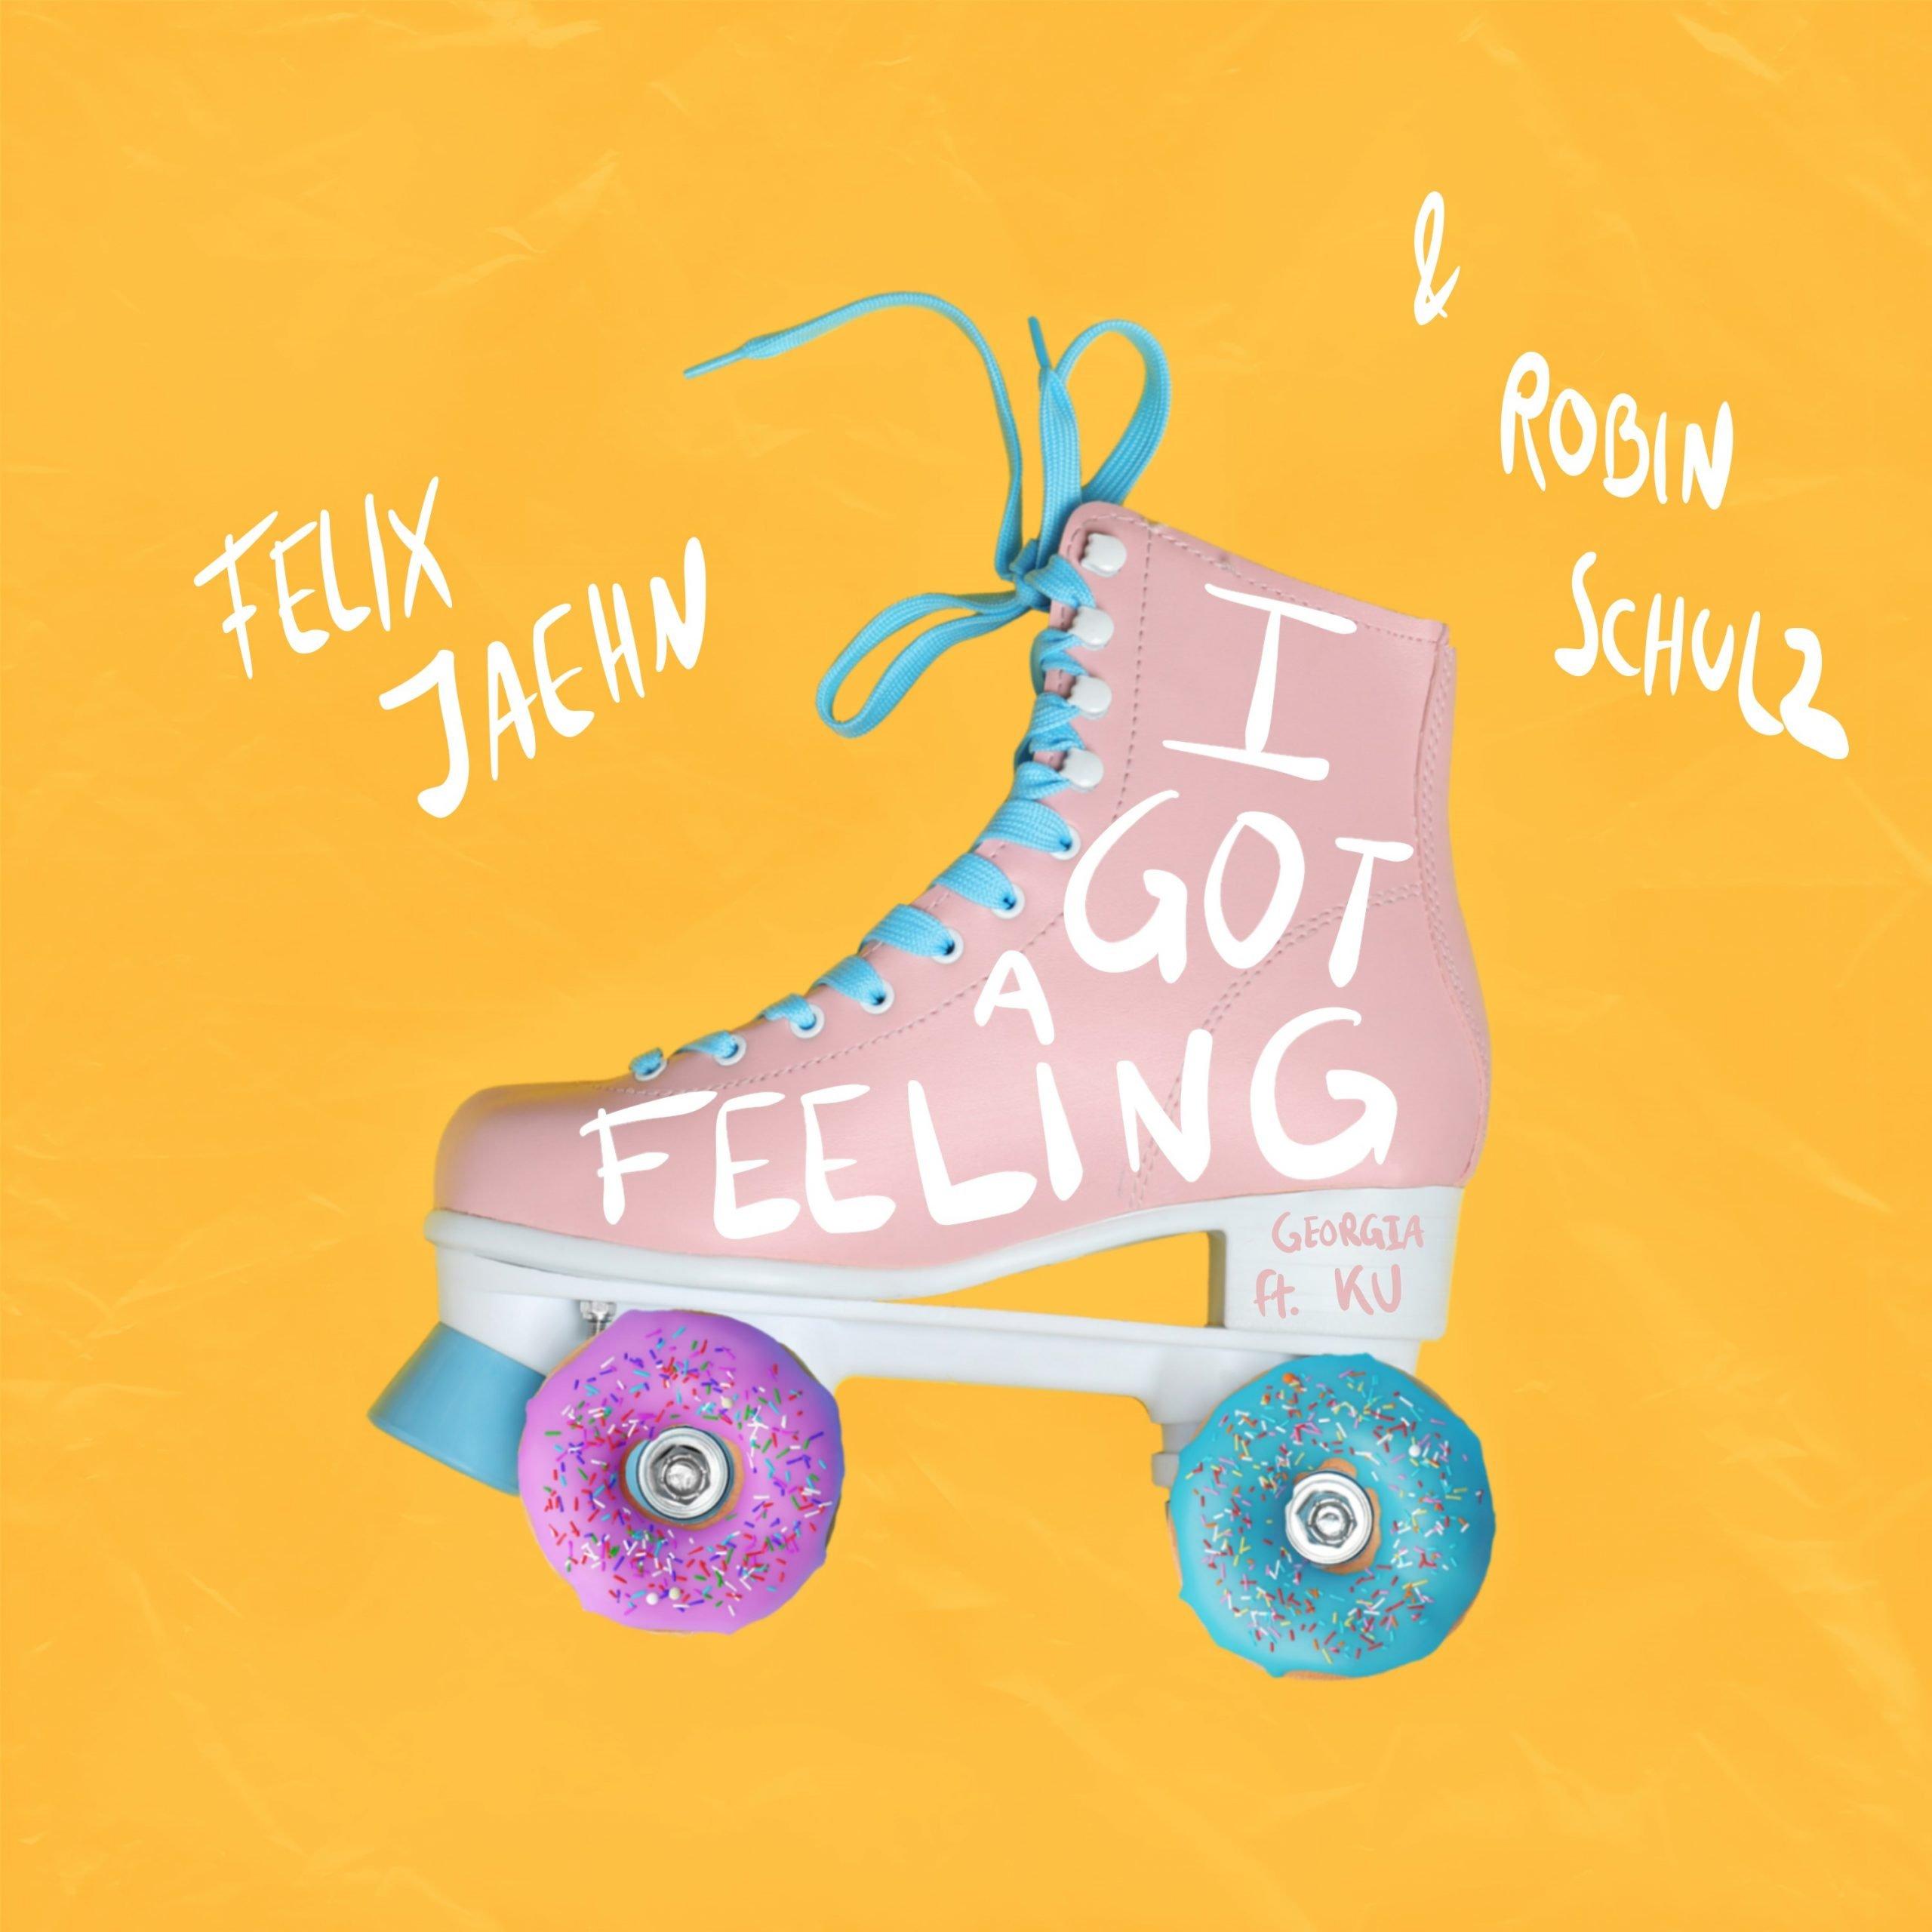 Felix Jaehn, Robin Schulz I GOT A FEELING - feat. Georgia Ku